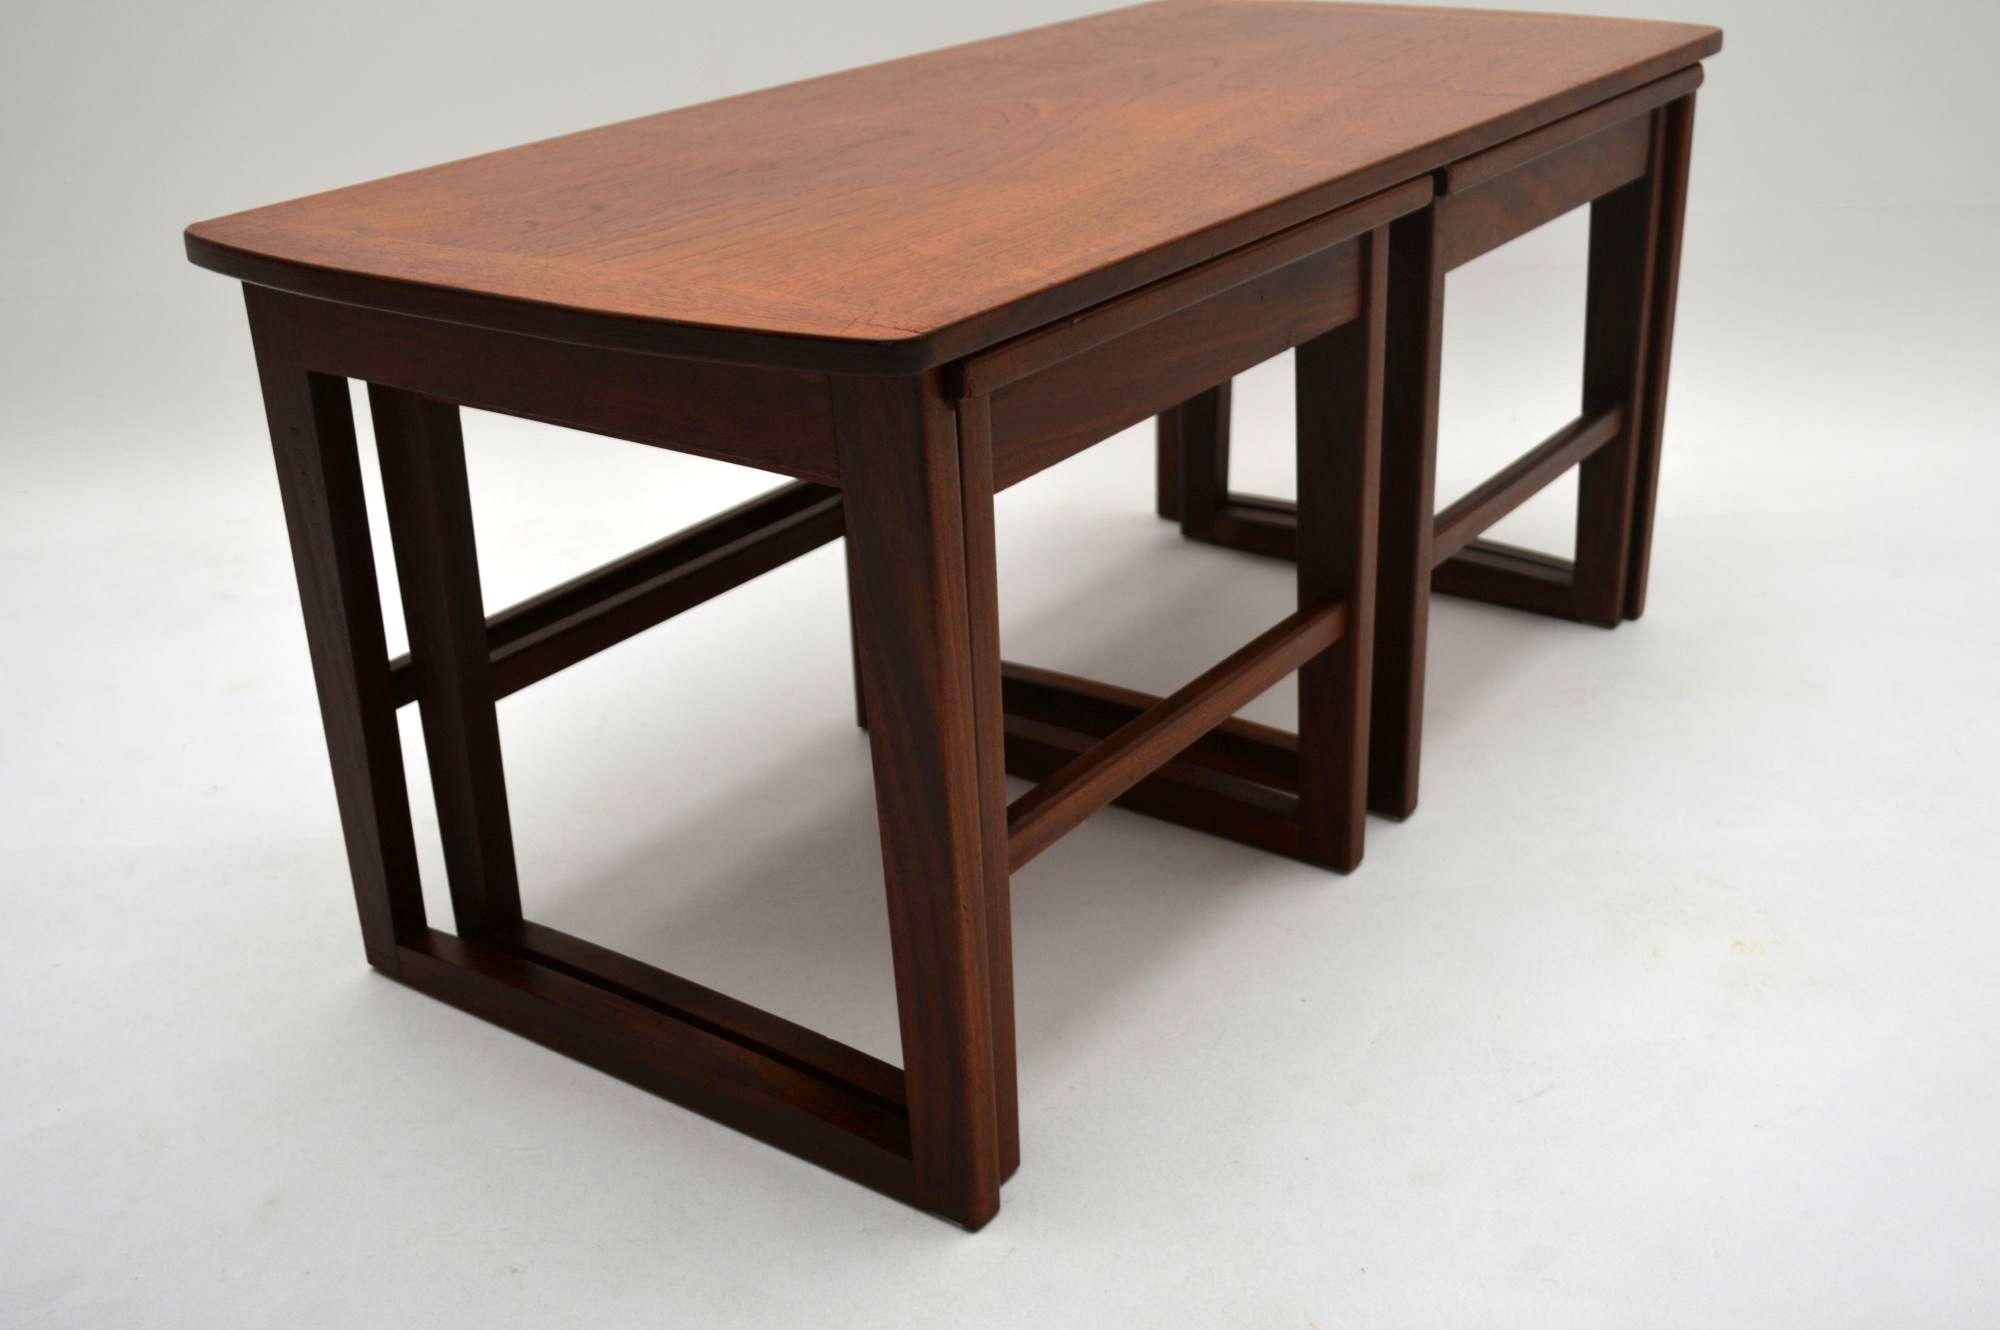 Retro Teak Nesting Coffee Table Vintage 1960 S Retrospective Interiors Vintage Furniture